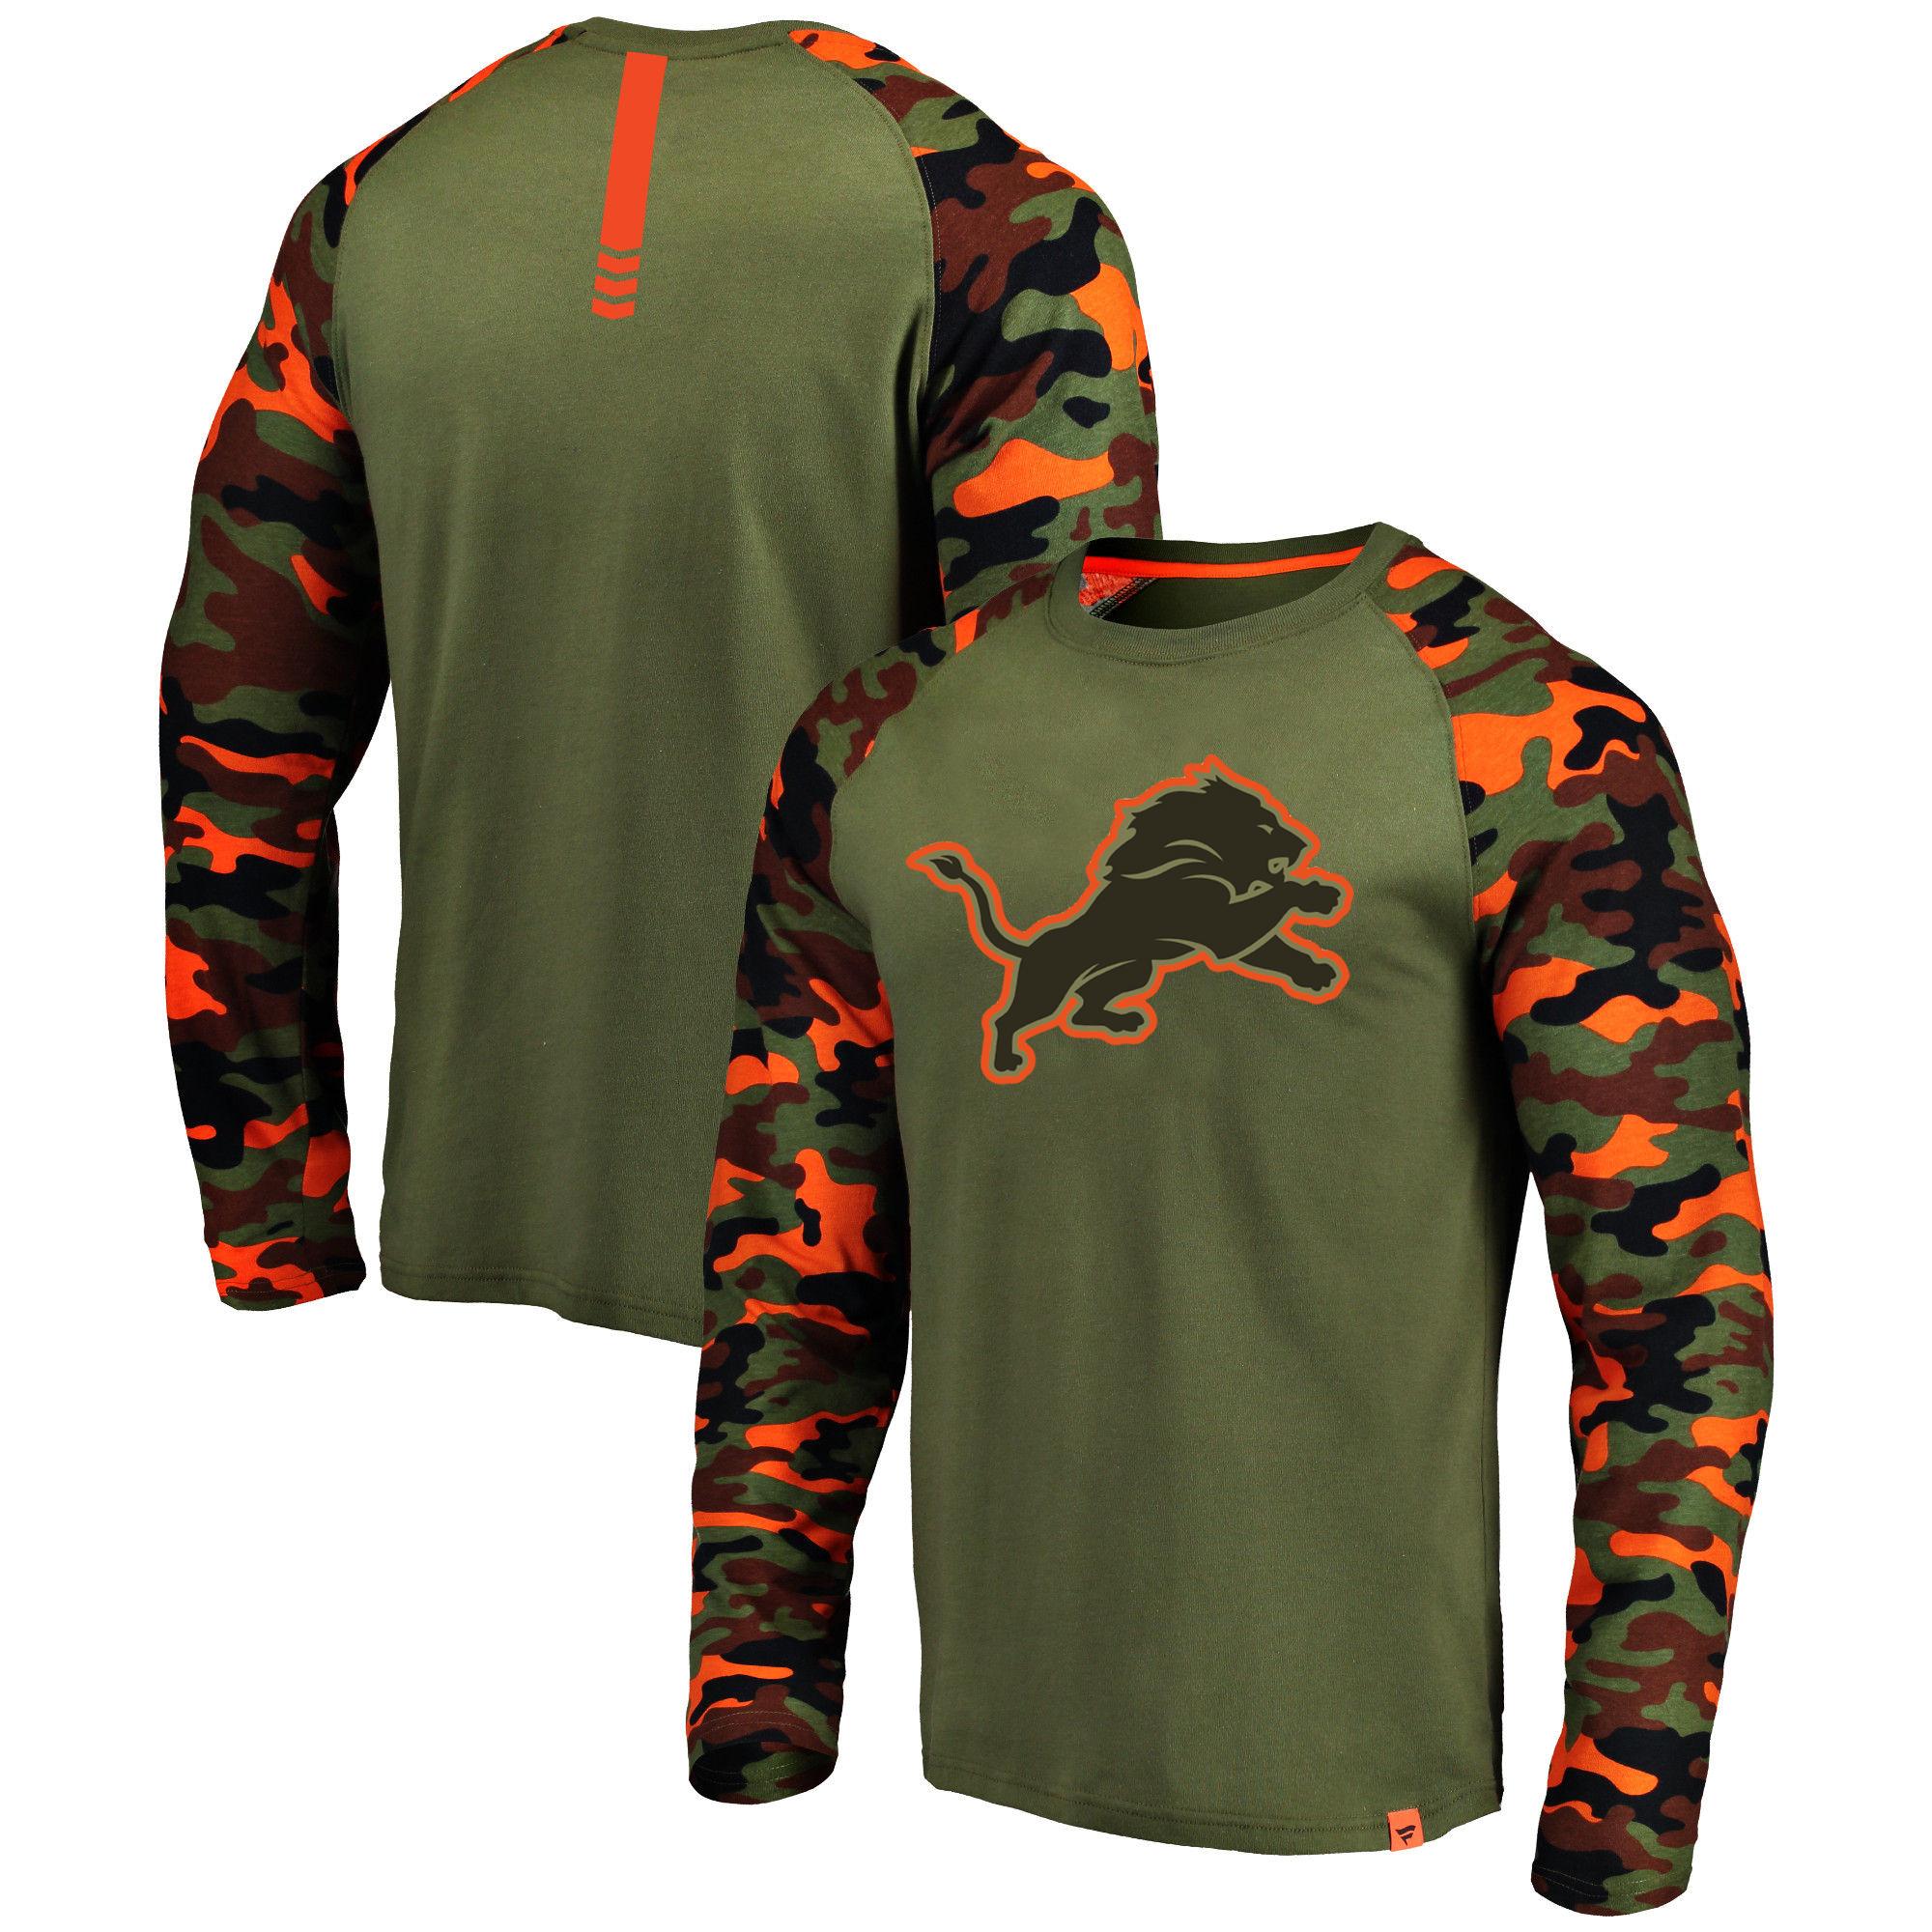 huge discount 4573f ca2ed Nfl T Shirts China